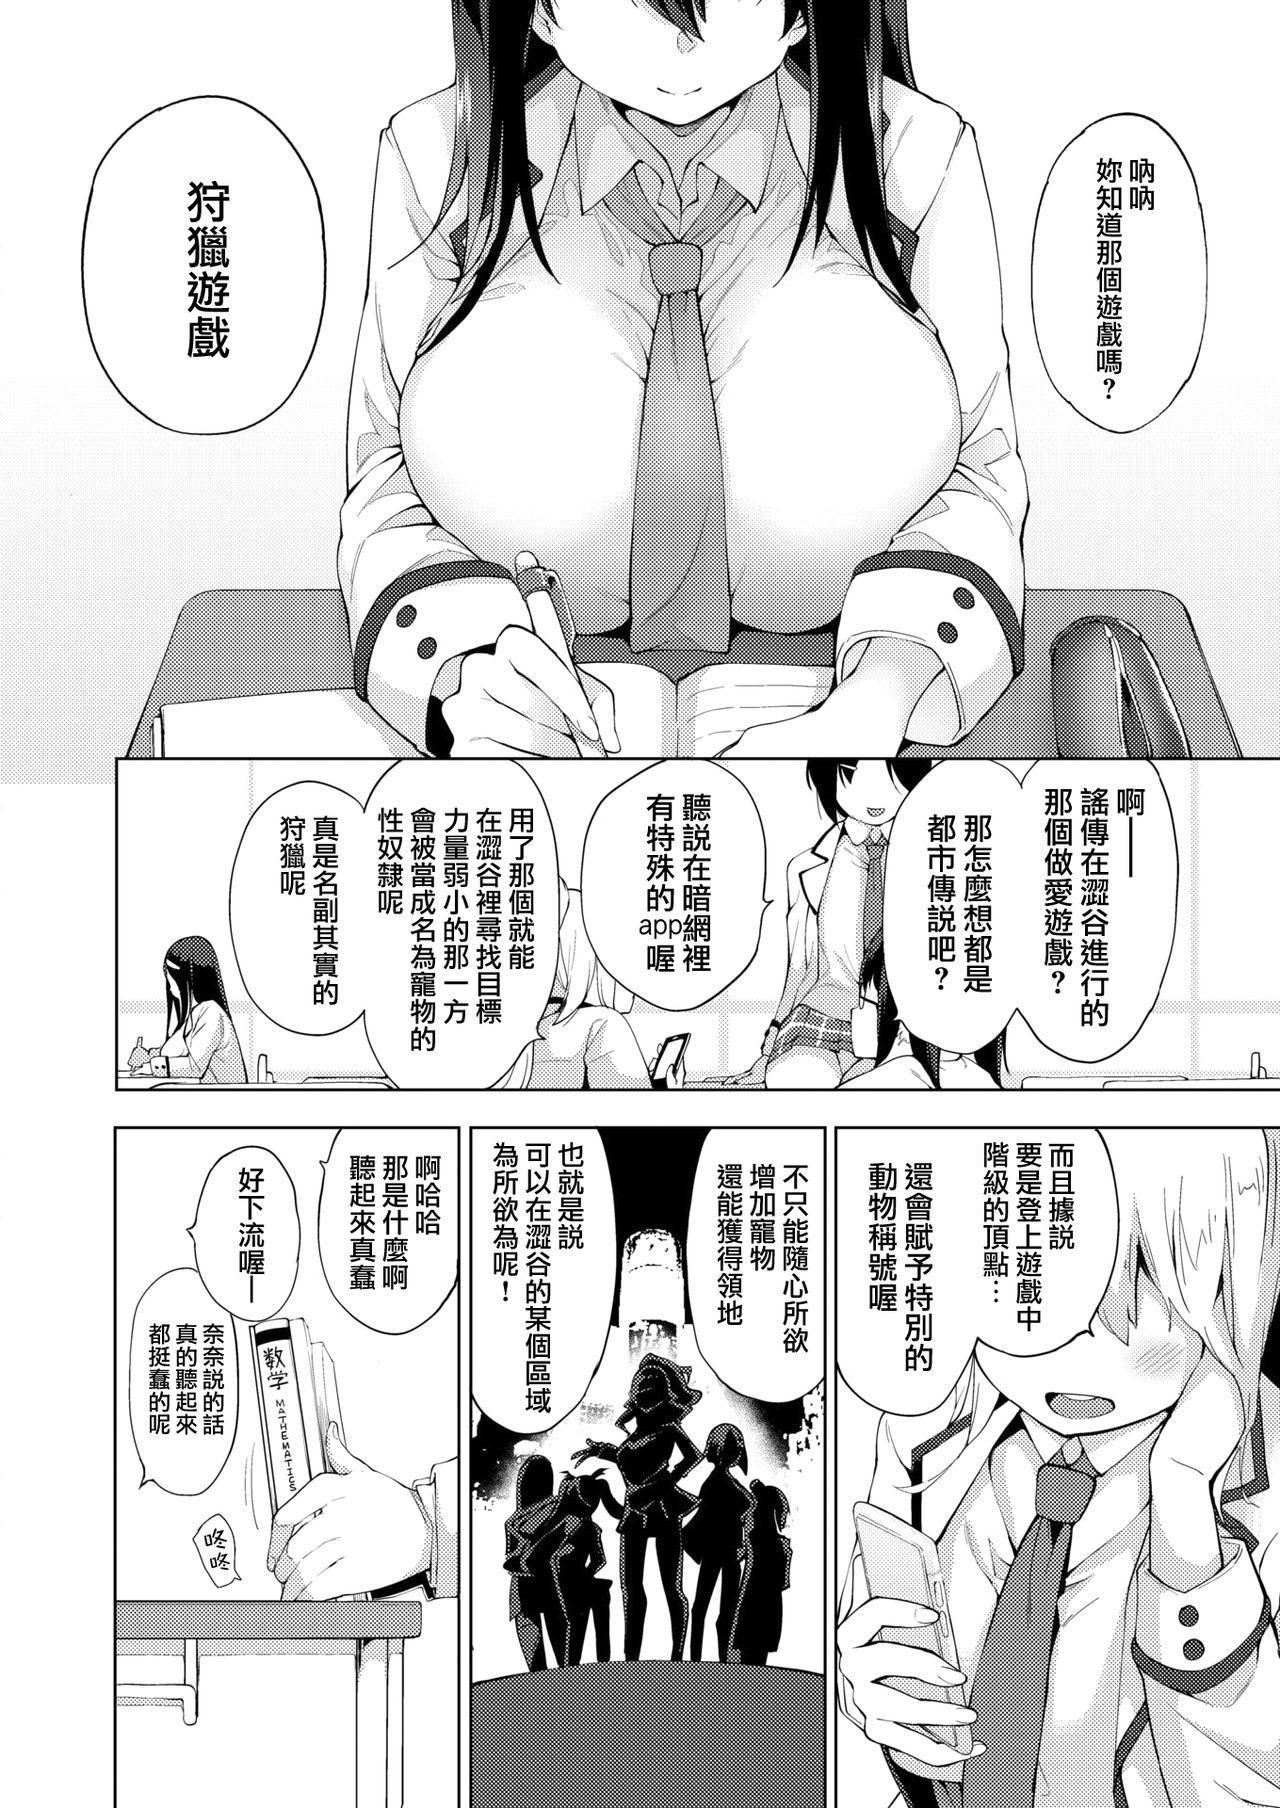 [Kenji] Karigogo ~Nikuyoku Shoujo~ #2 (COMIC X-EROS #67) [Chinese] [就變態翻譯組一人樣 x 我尻故我在個人漢化#17] [Digital] 1